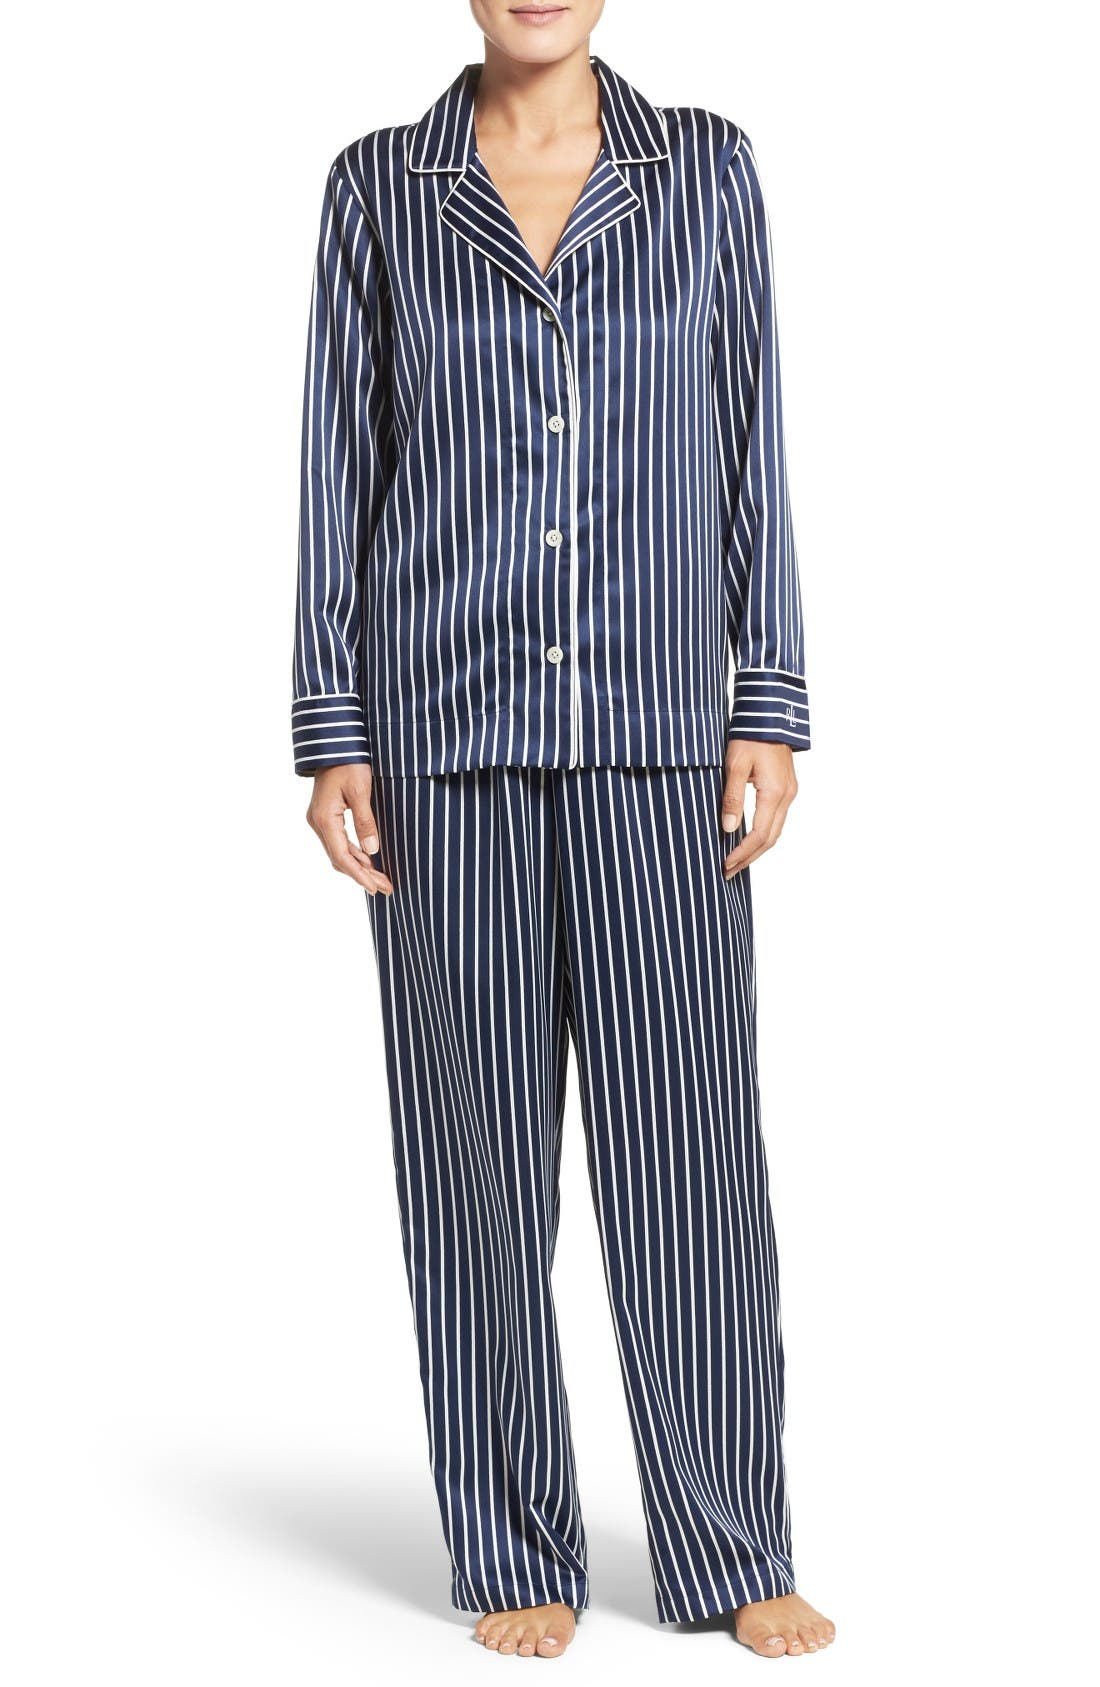 Alternate Image 1 Selected - Lauren Ralph Lauren Stripe Satin Pajamas